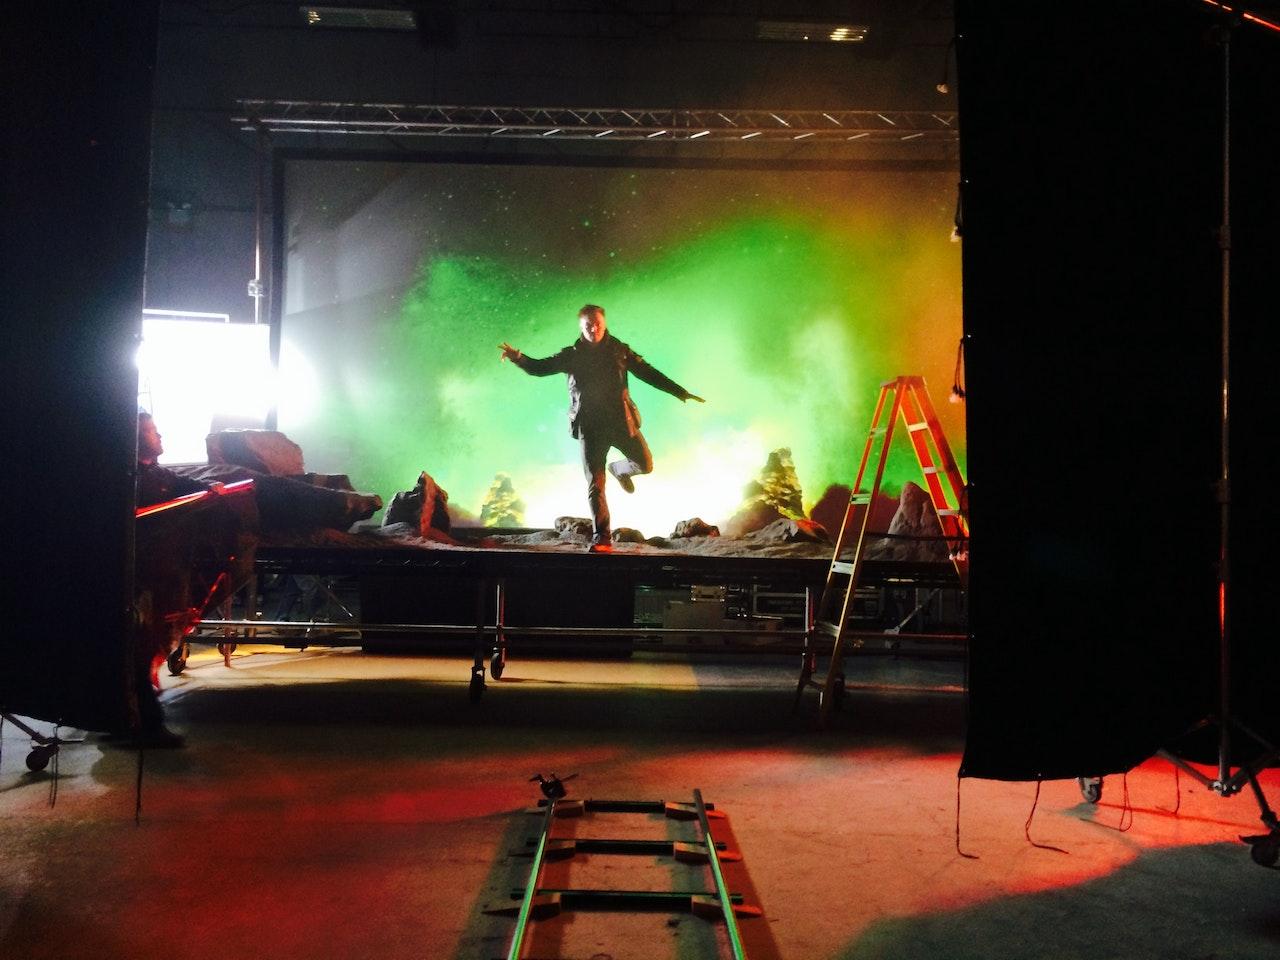 BEHIND THE SCENES: Metronomy 'Aquarius' by Director:  Edouard Salier